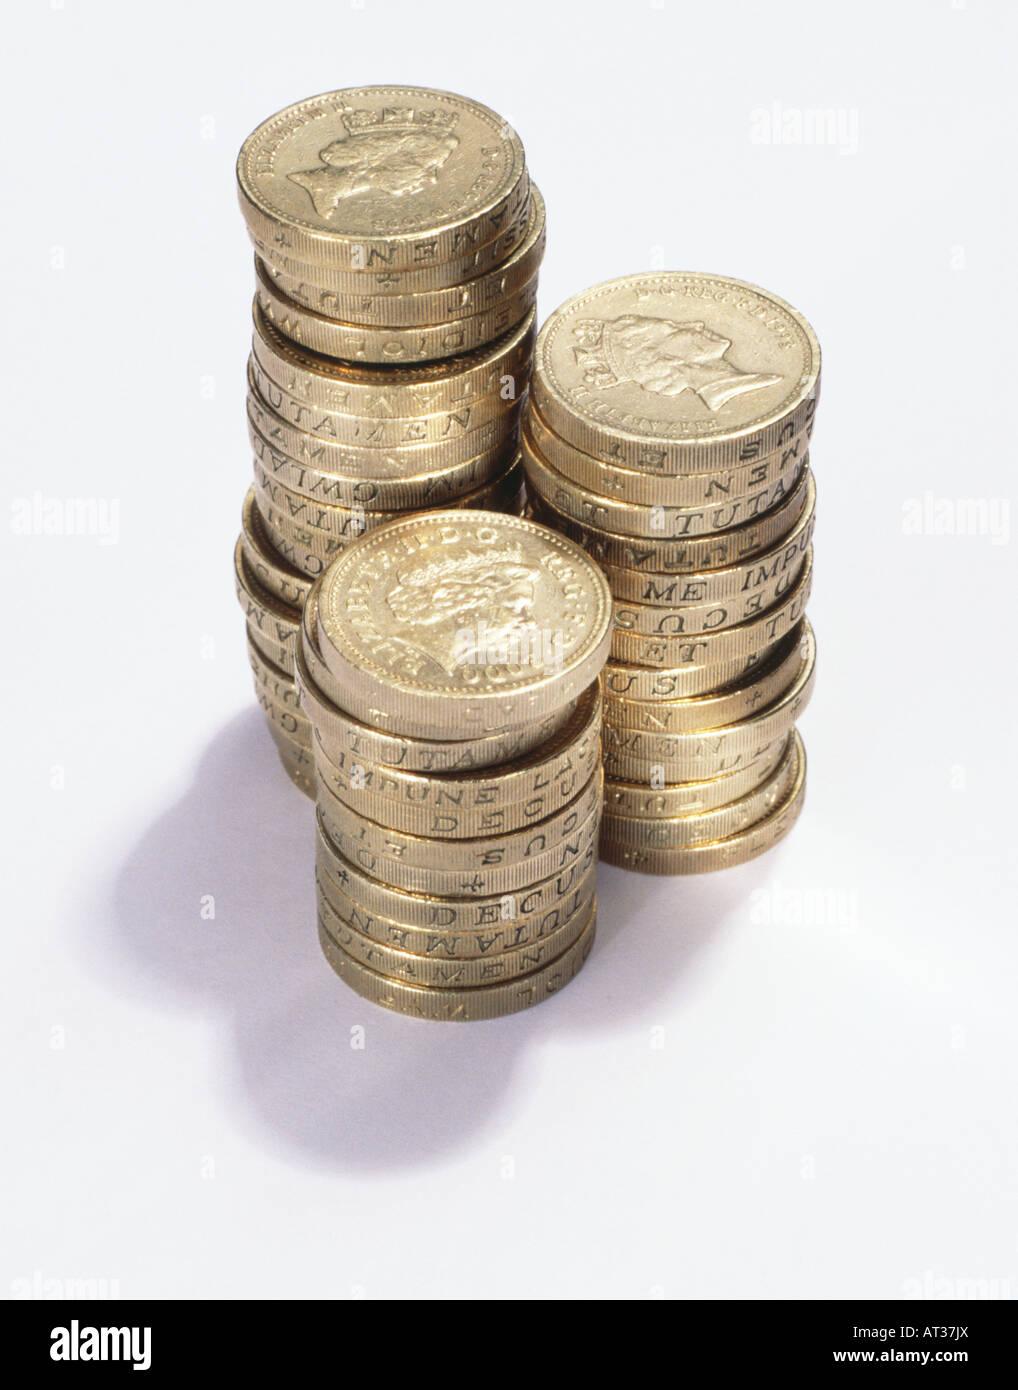 Three piles of pound coins - Stock Image